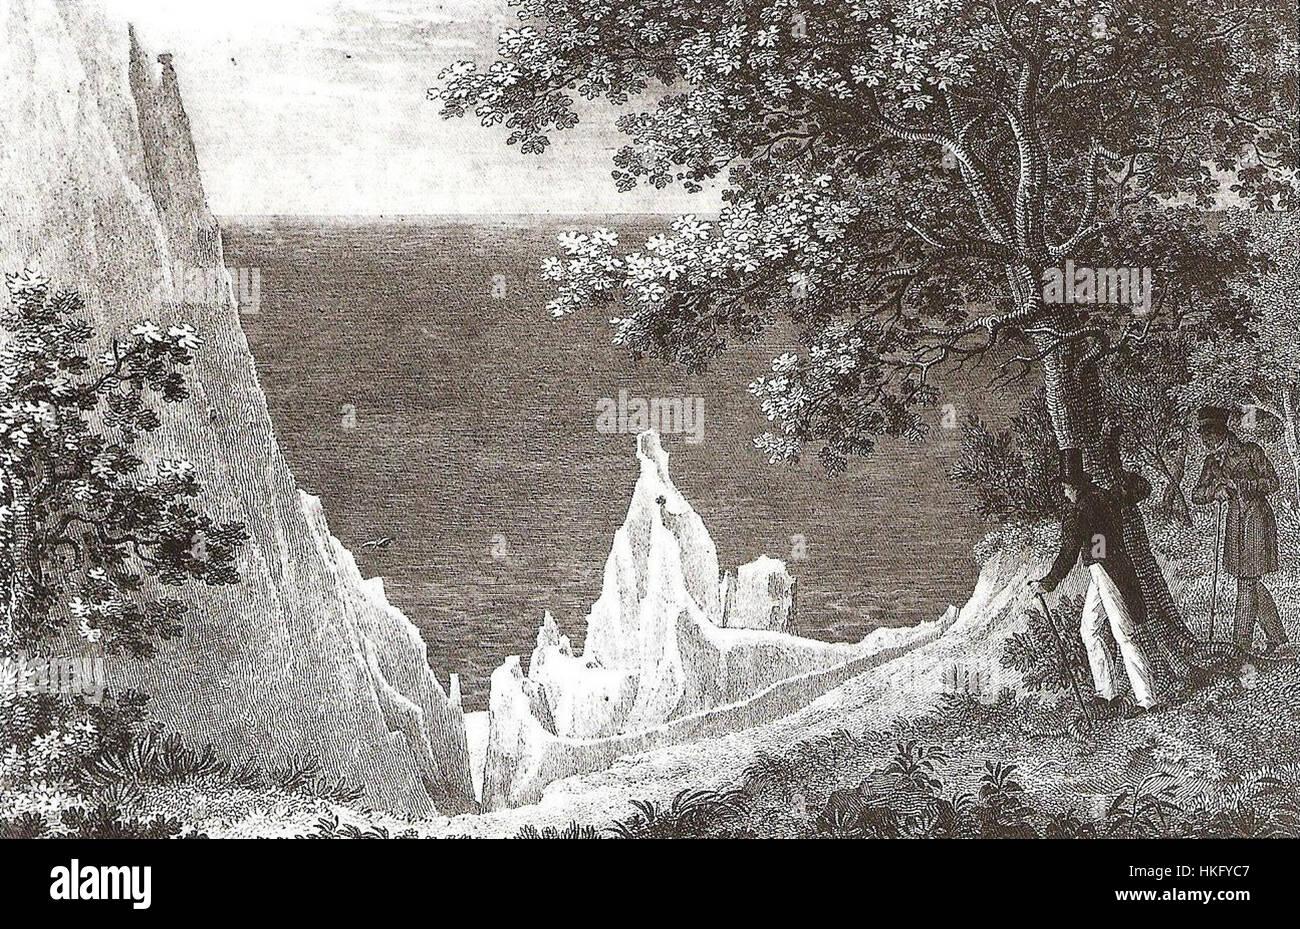 Stubbenkammer (Stahlstich) - Stock Image